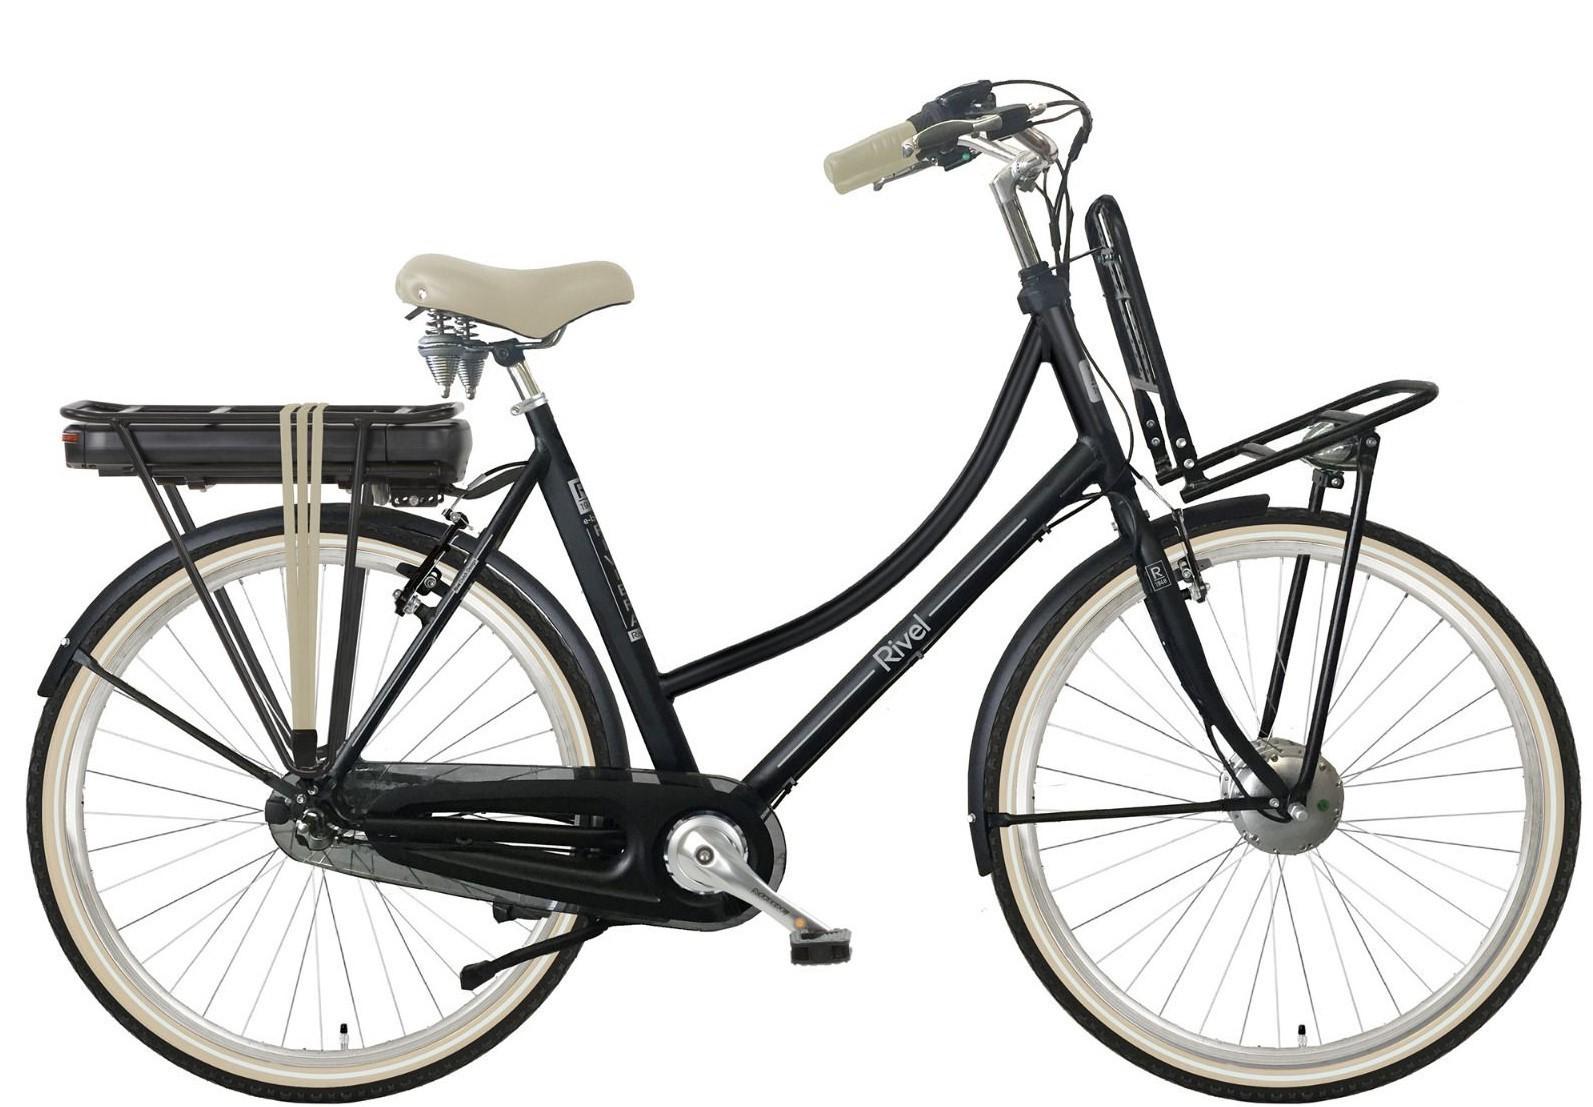 Rivel Riviera E-bike 3V VB met voorwielmotor